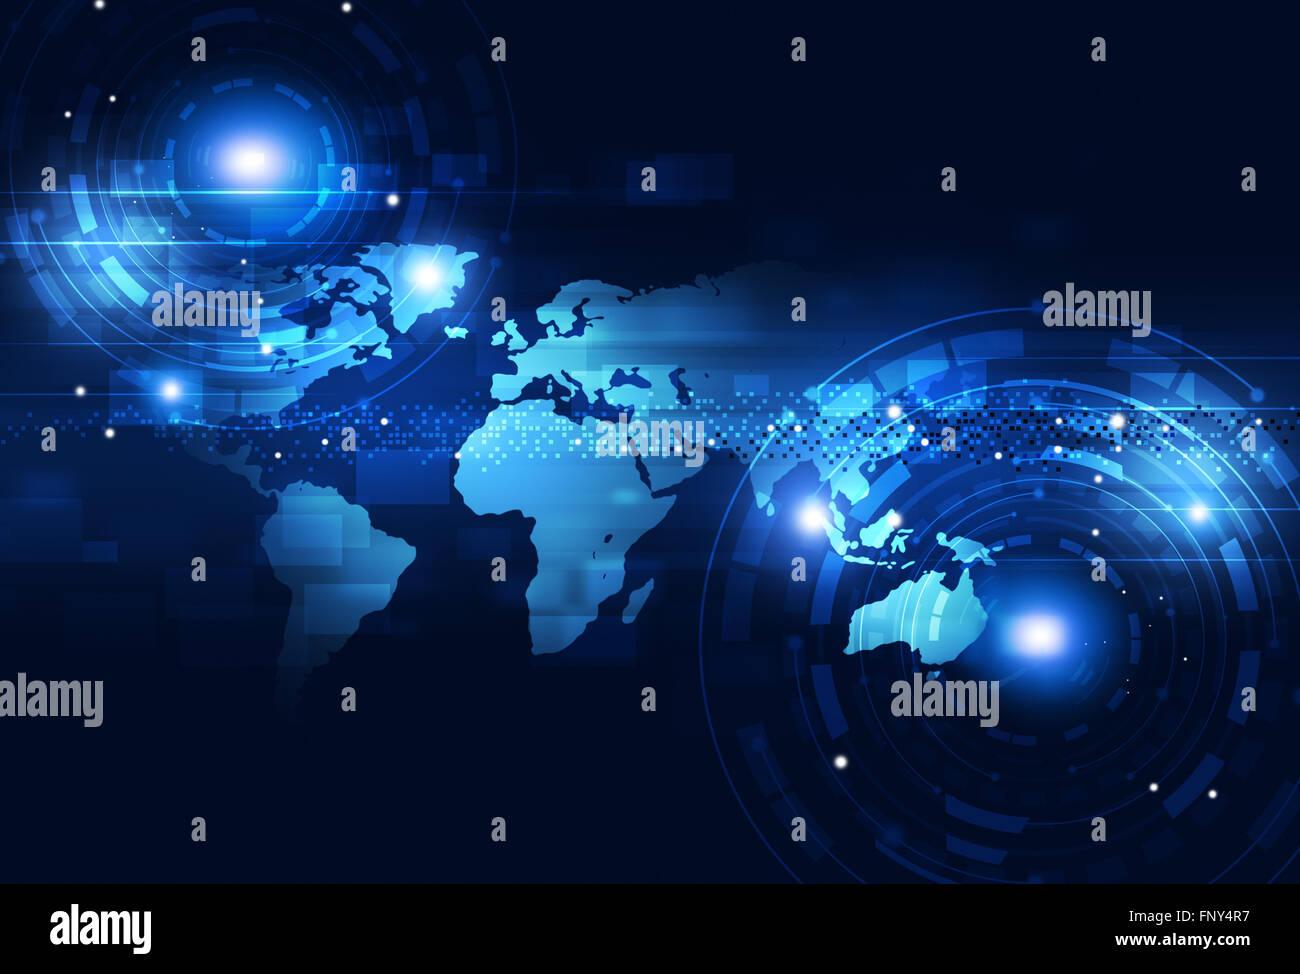 digital world of business technology communications blue background - Stock Image